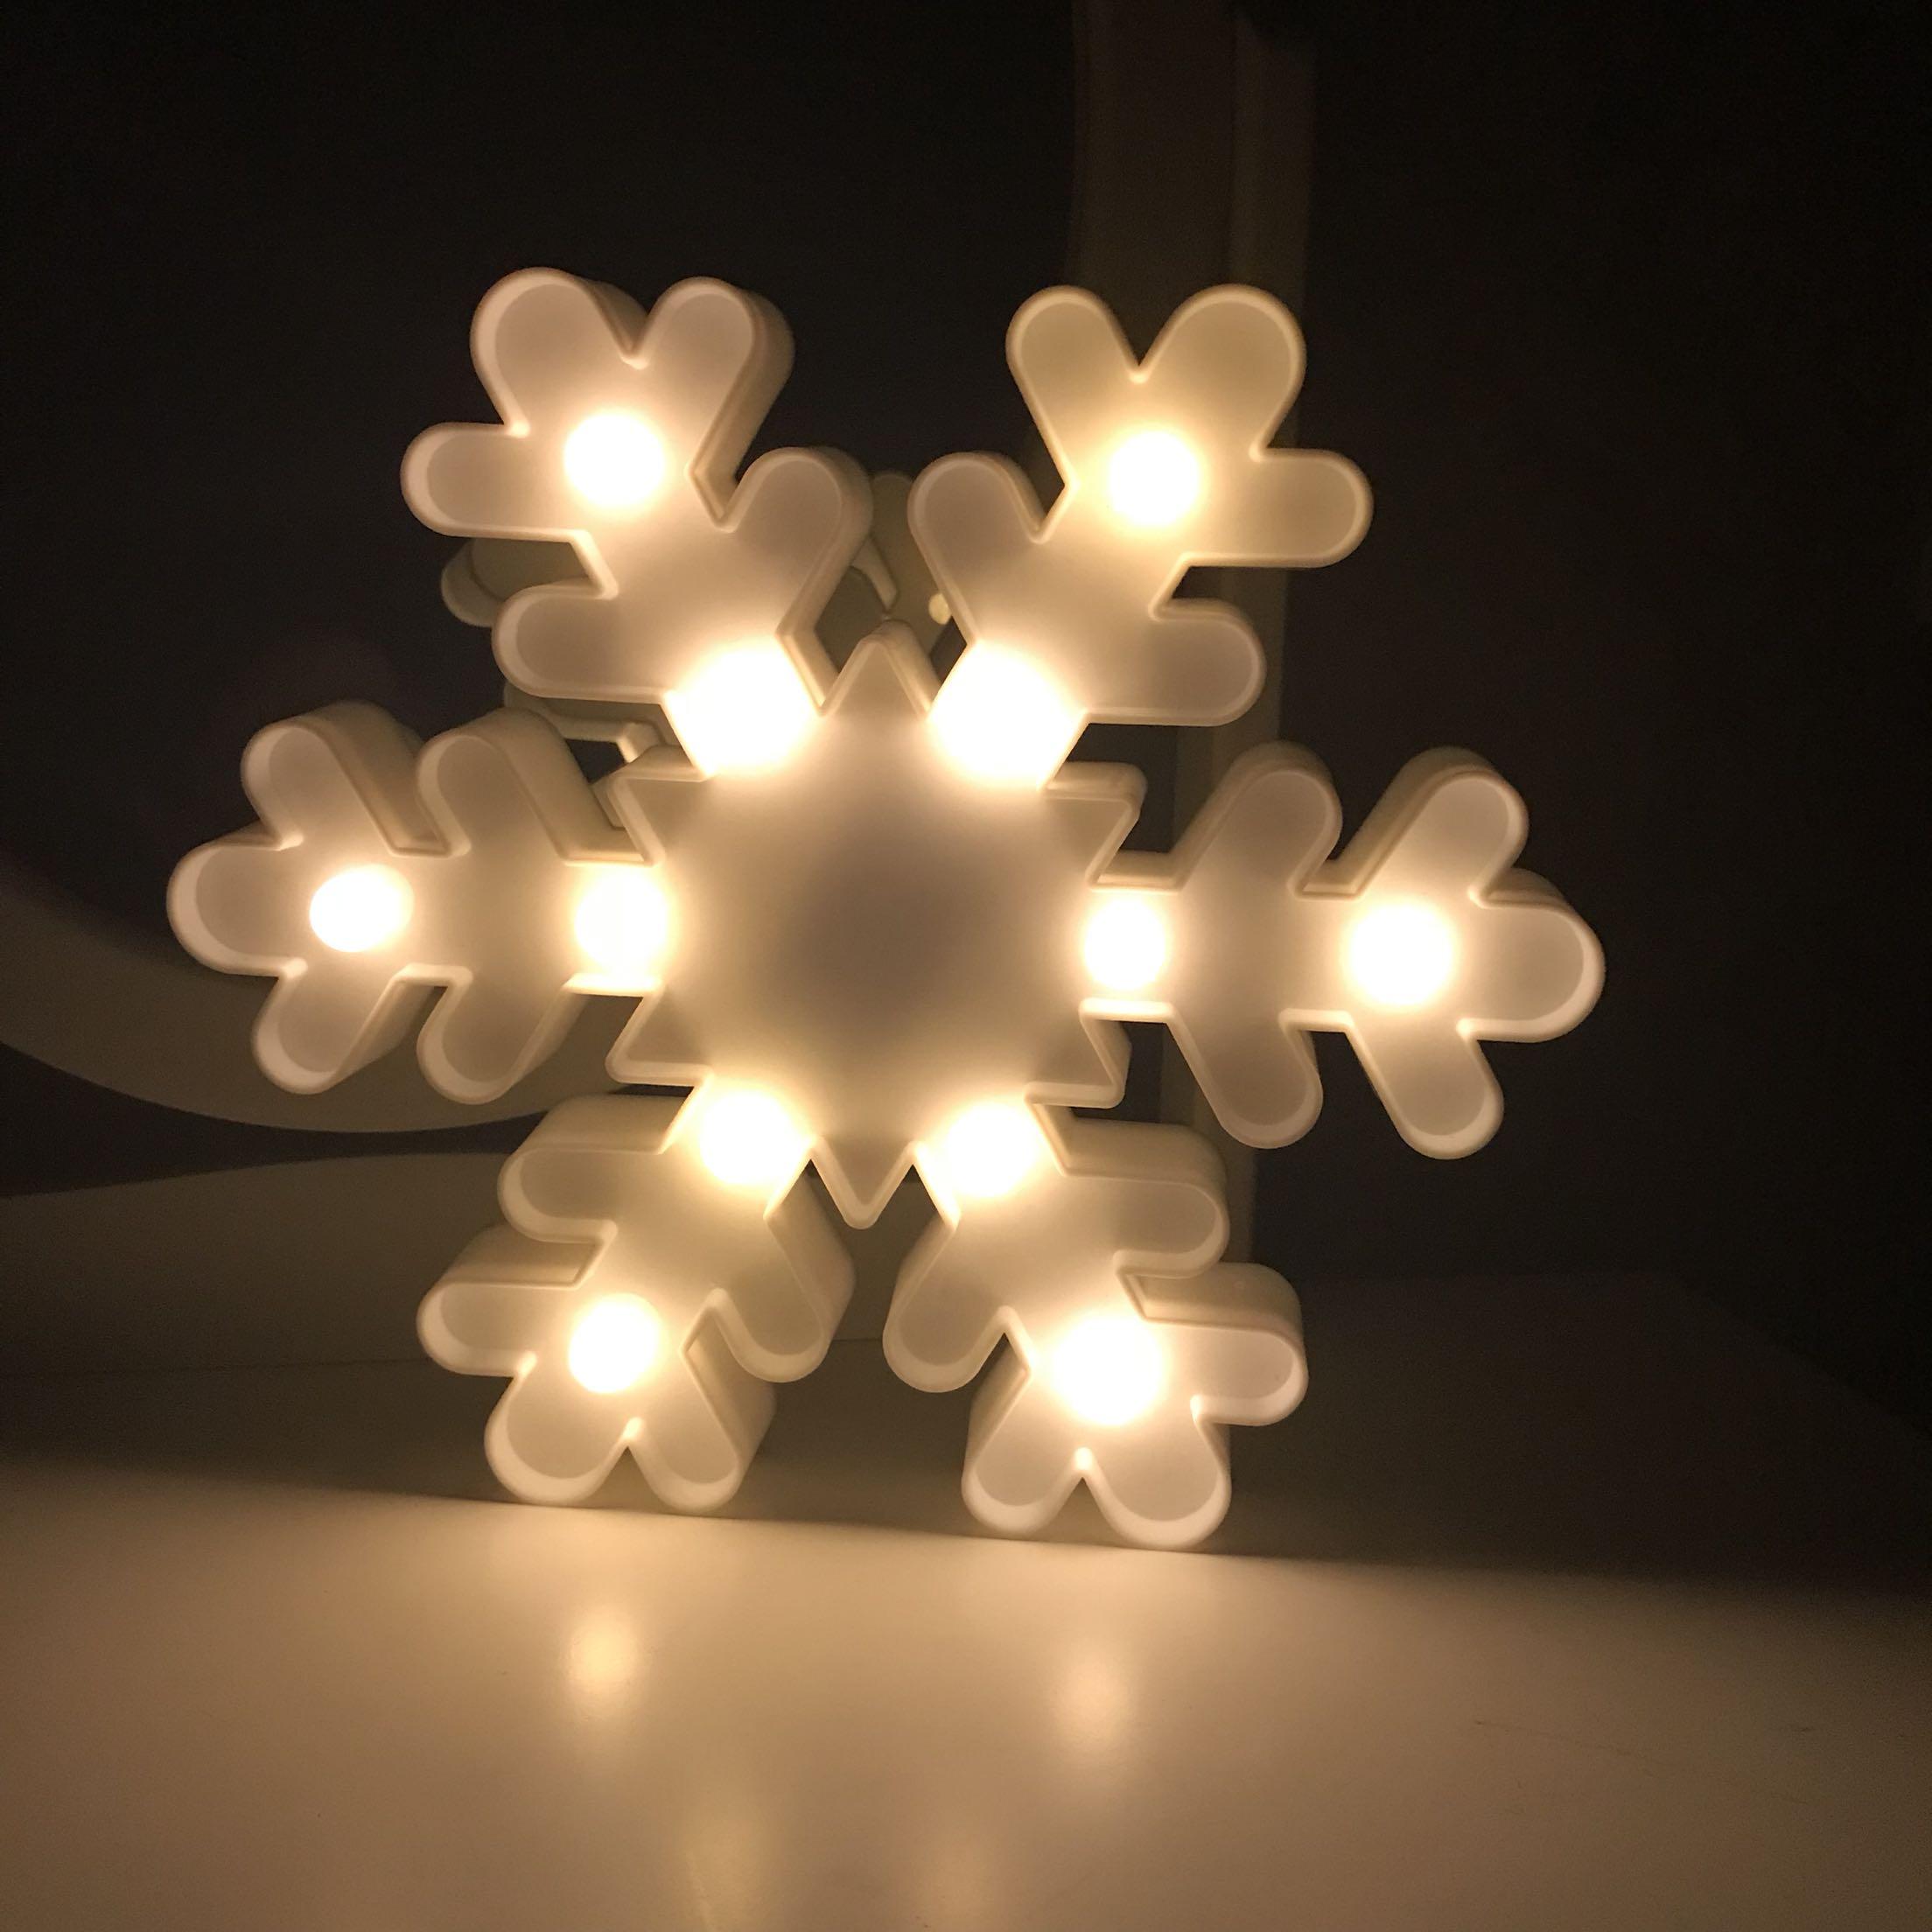 led雪花造型灯圣诞节日礼物ins摆拍字母月亮星星云朵小夜灯装饰品图片